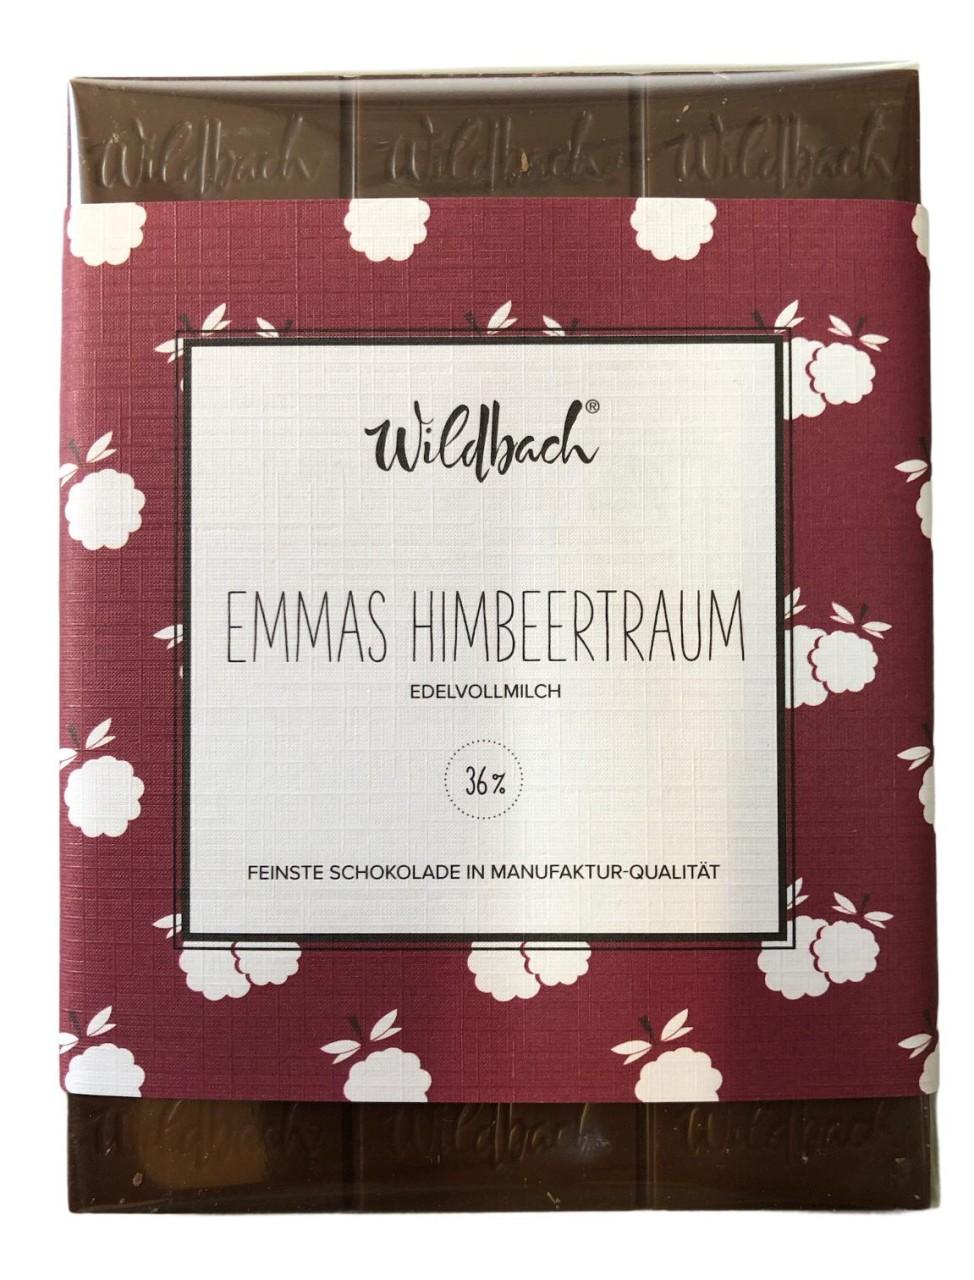 Wildbach Emmas Himbeertraum 36% 70g